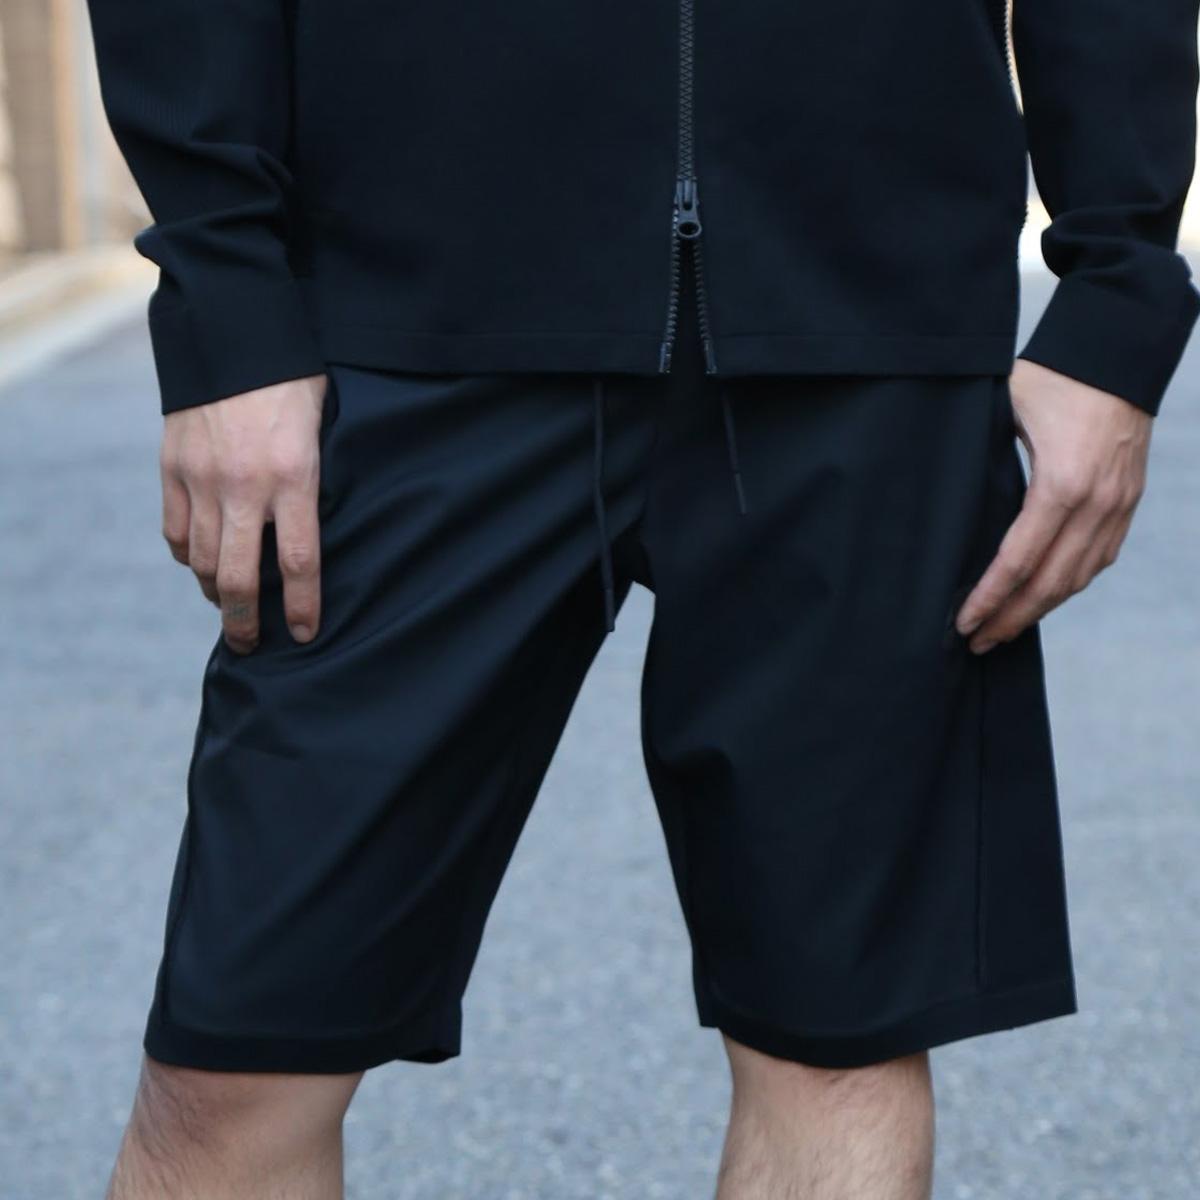 NIKE AS M NSW TCH KNT SHORT (ナイキ テック ニット ショート) BLACK/BLACK【メンズ ショーツ】18SU-S